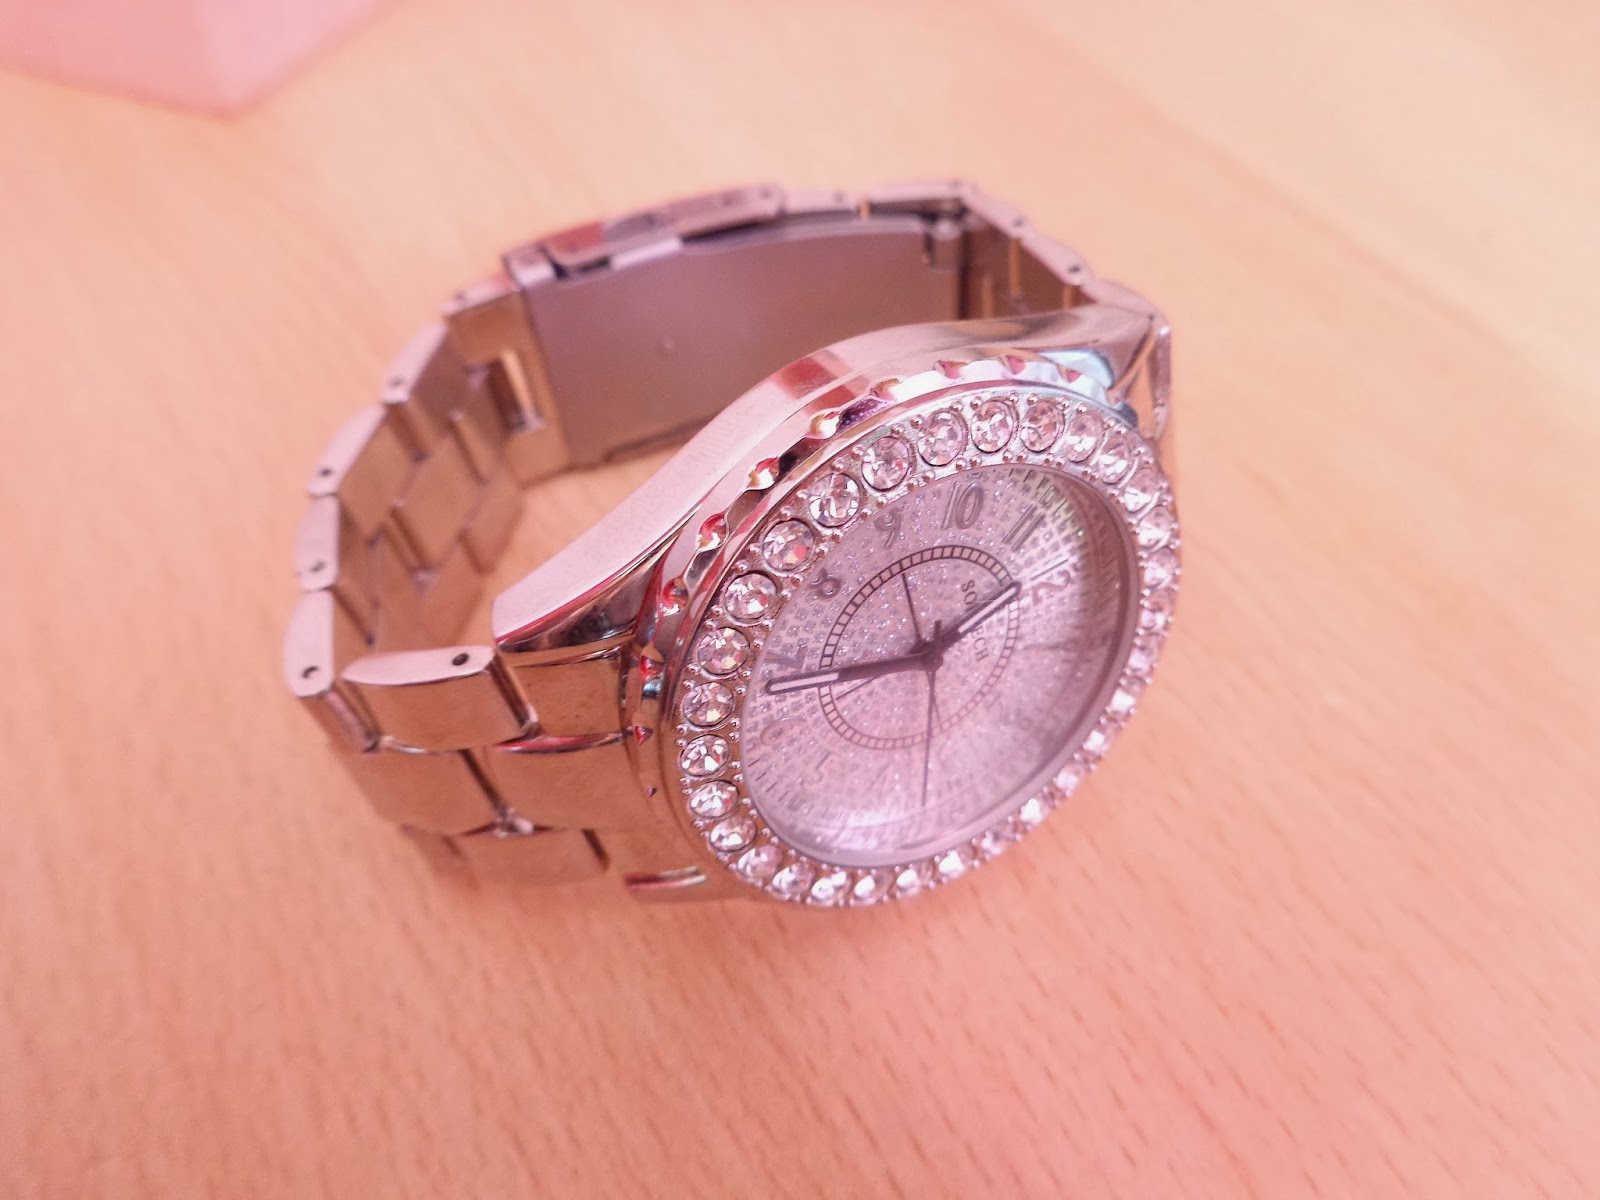 4itgirls watch review jenna suth for Nice watch for boyfriend